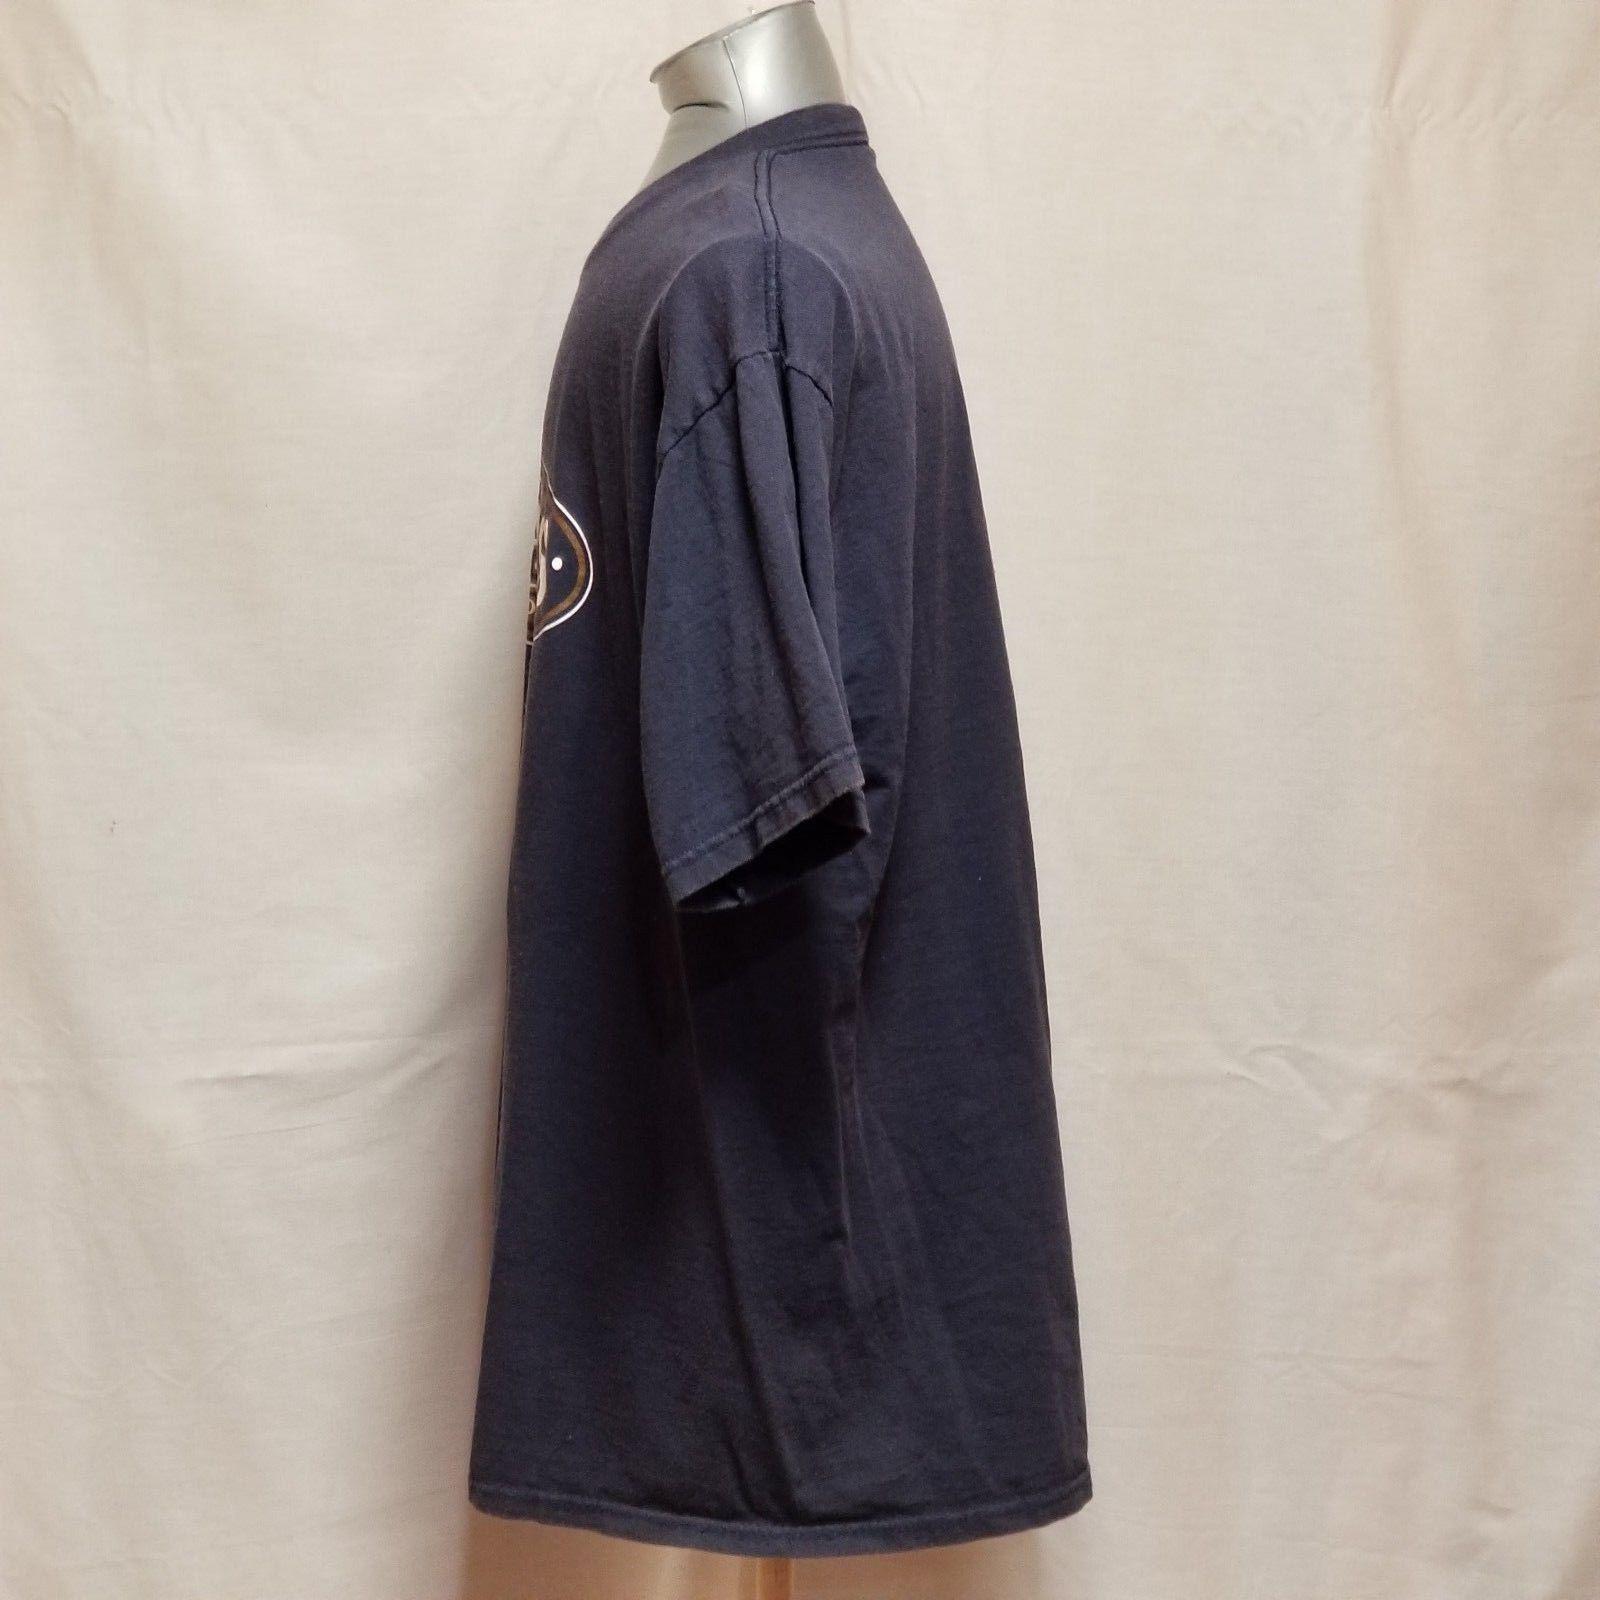 St. Louis Rams NFL Football Mens Size XL Blue Short Sleeve T Shirt image 3